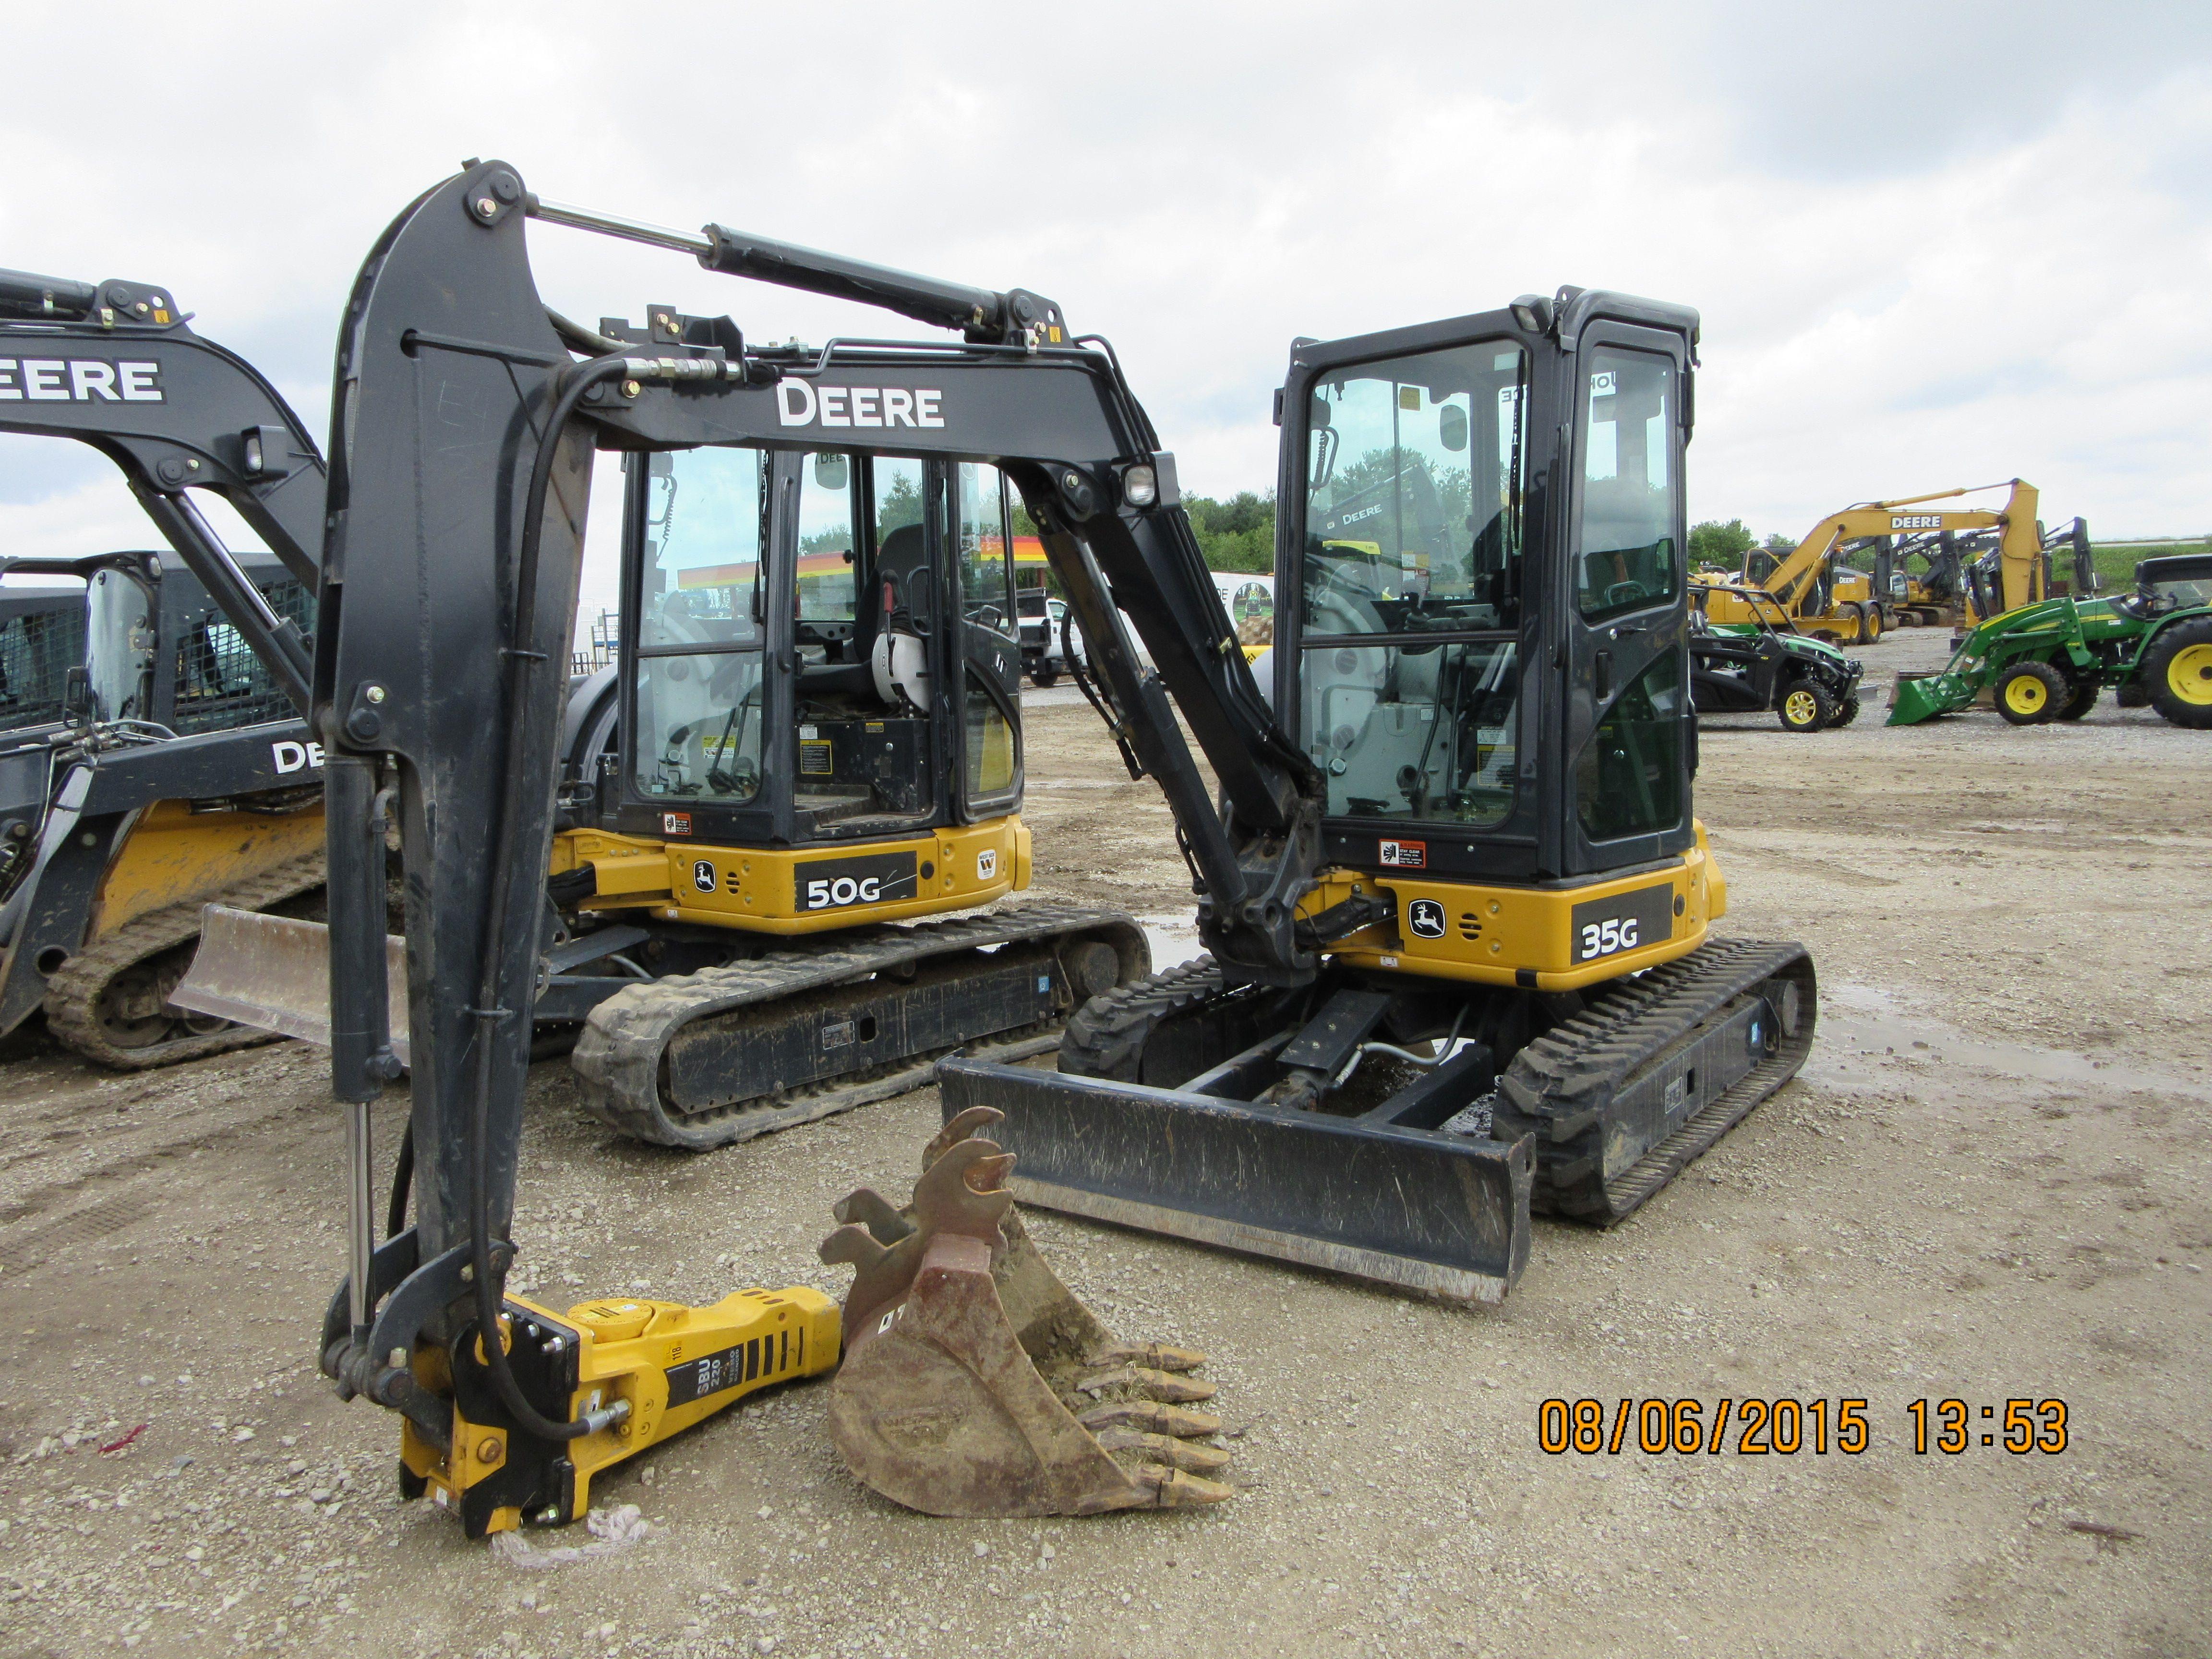 John Deere 35G | JD construction equipment | Tractors